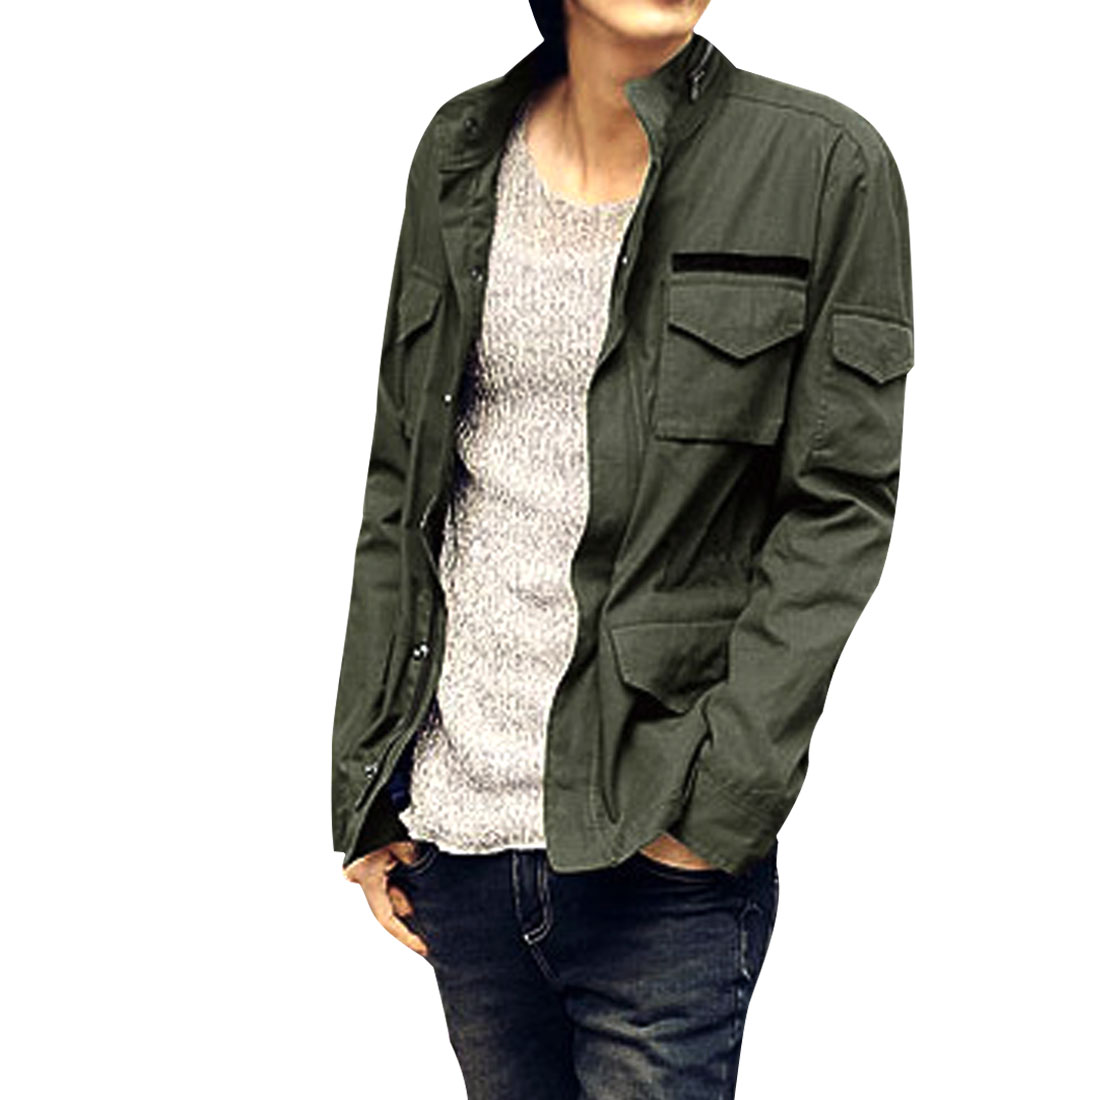 Men Stylish Long Sleeves Four Pockets Front Olive Green Jacket M